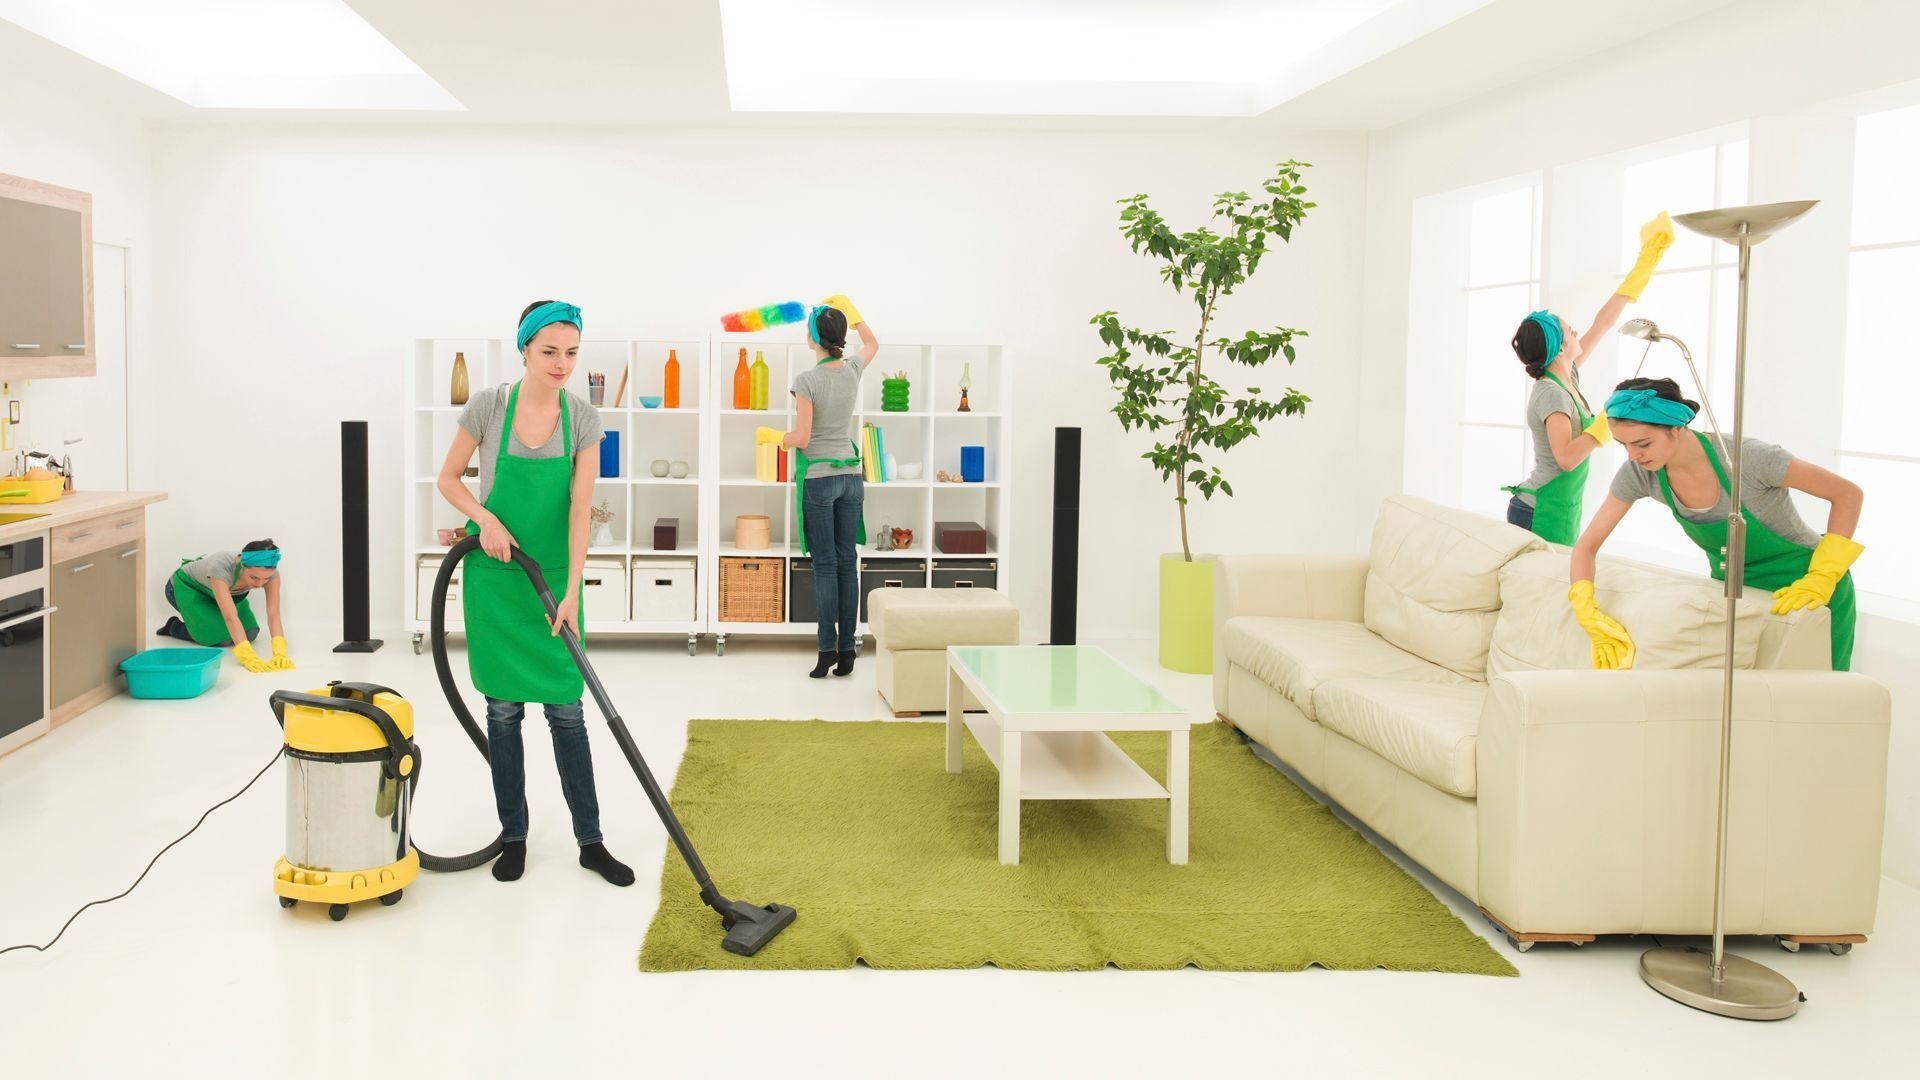 Empresa de limpieza de viviendas en Vélez-Málaga